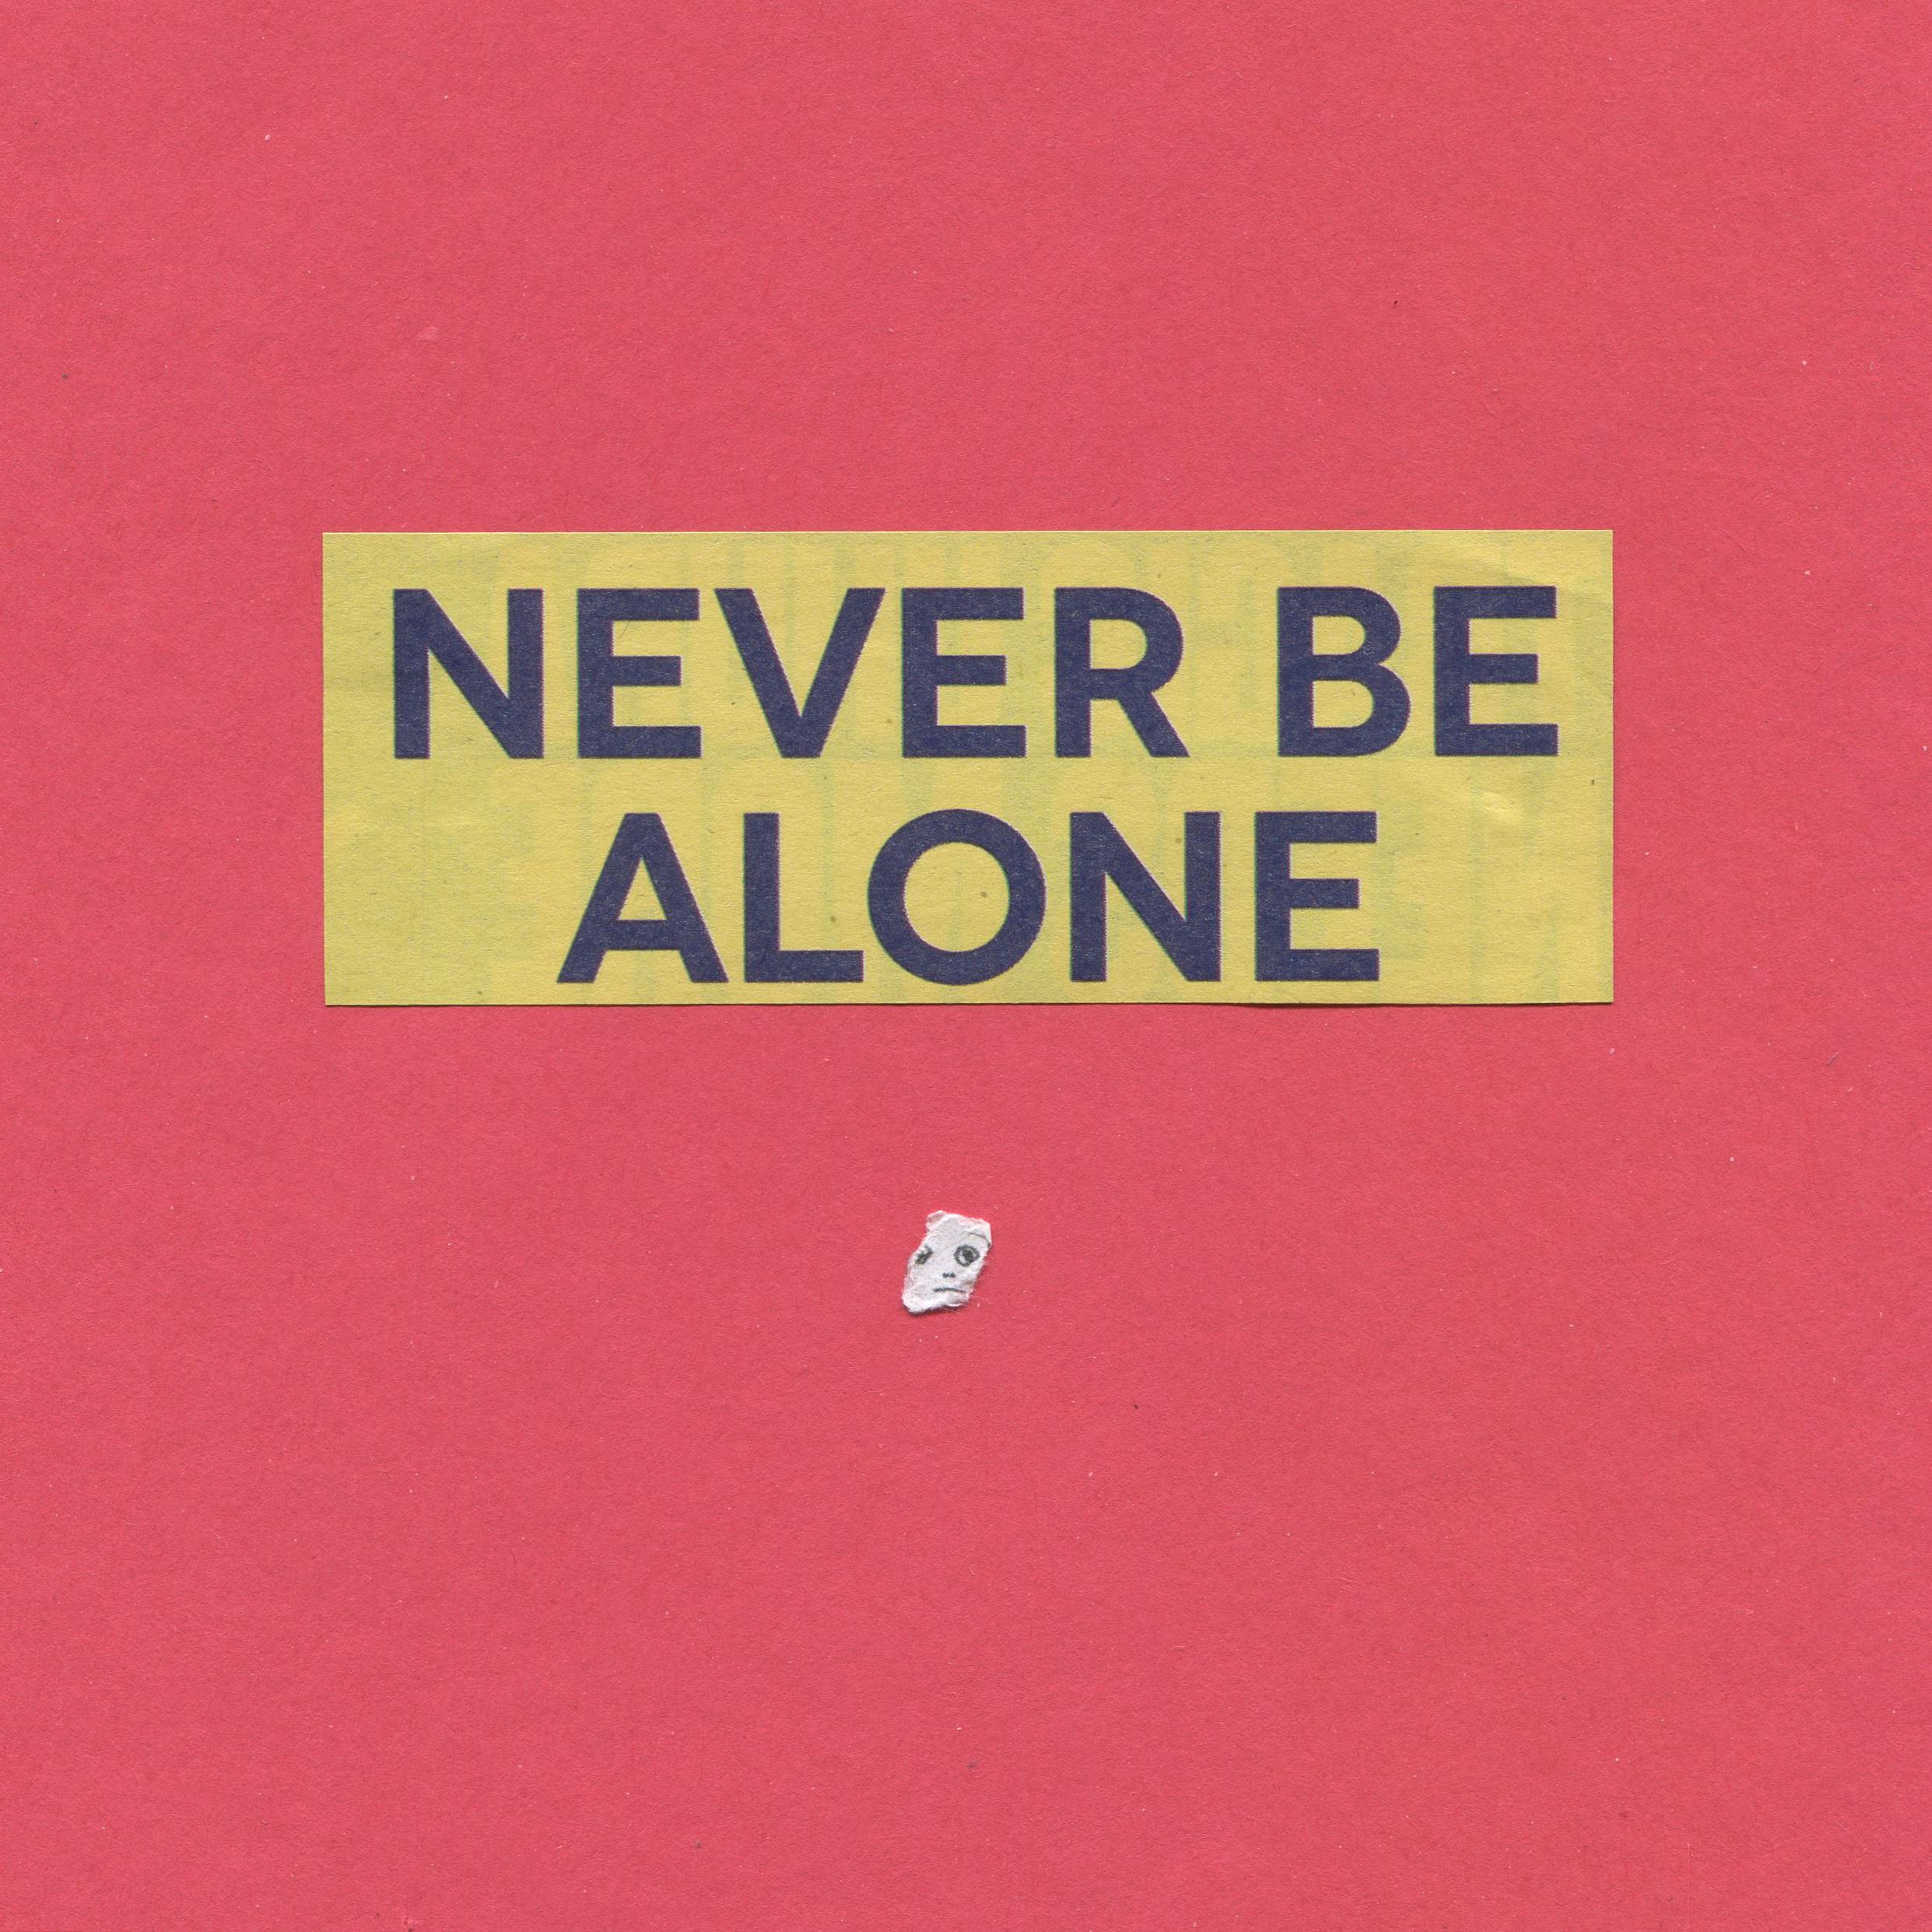 alone099.jpg